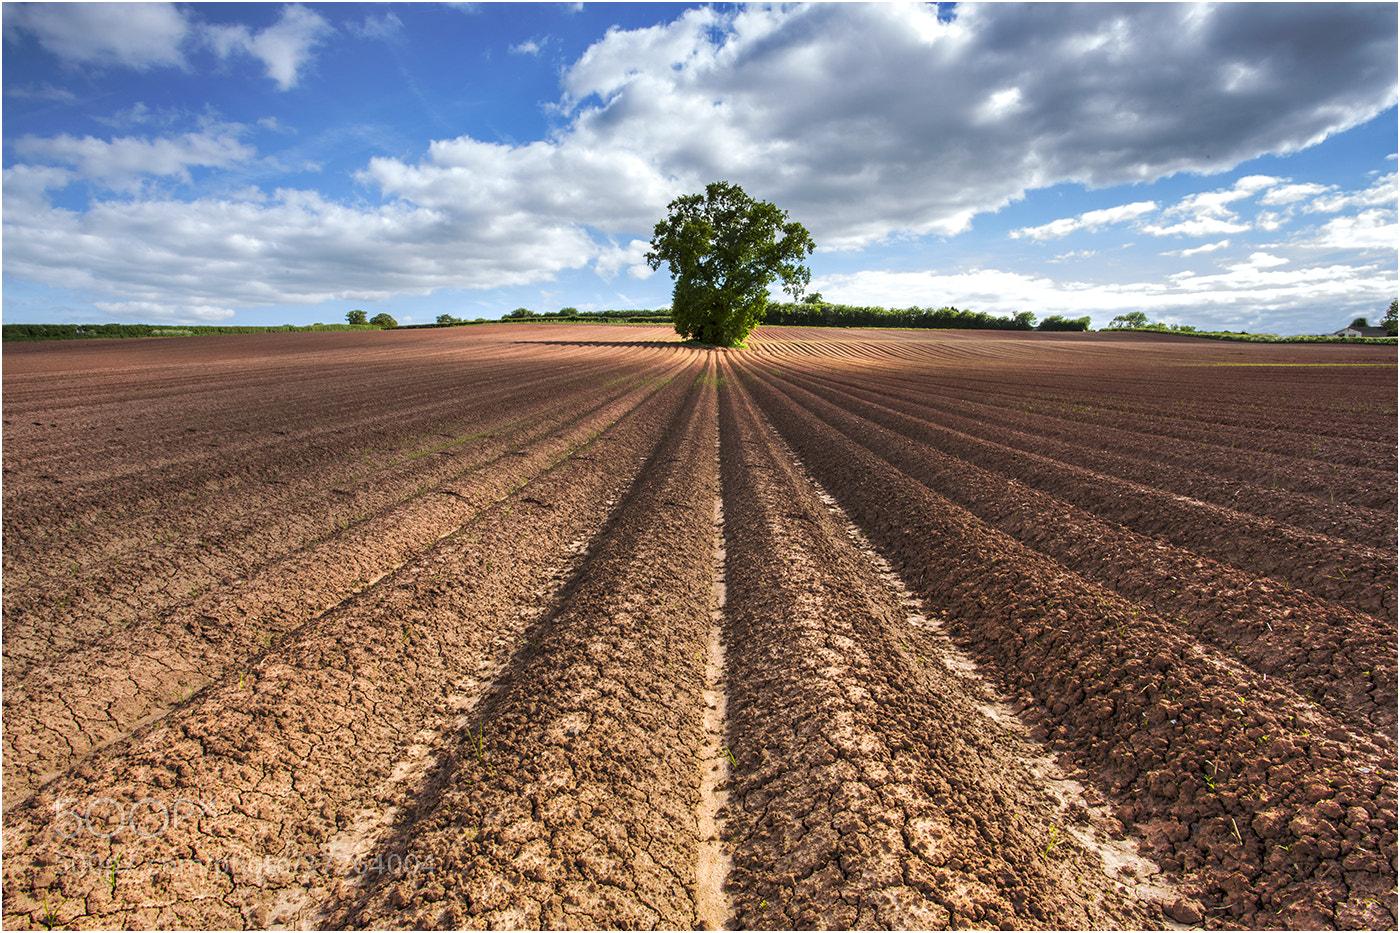 Photograph Landscape Brocolli by Alan Coles on 500px